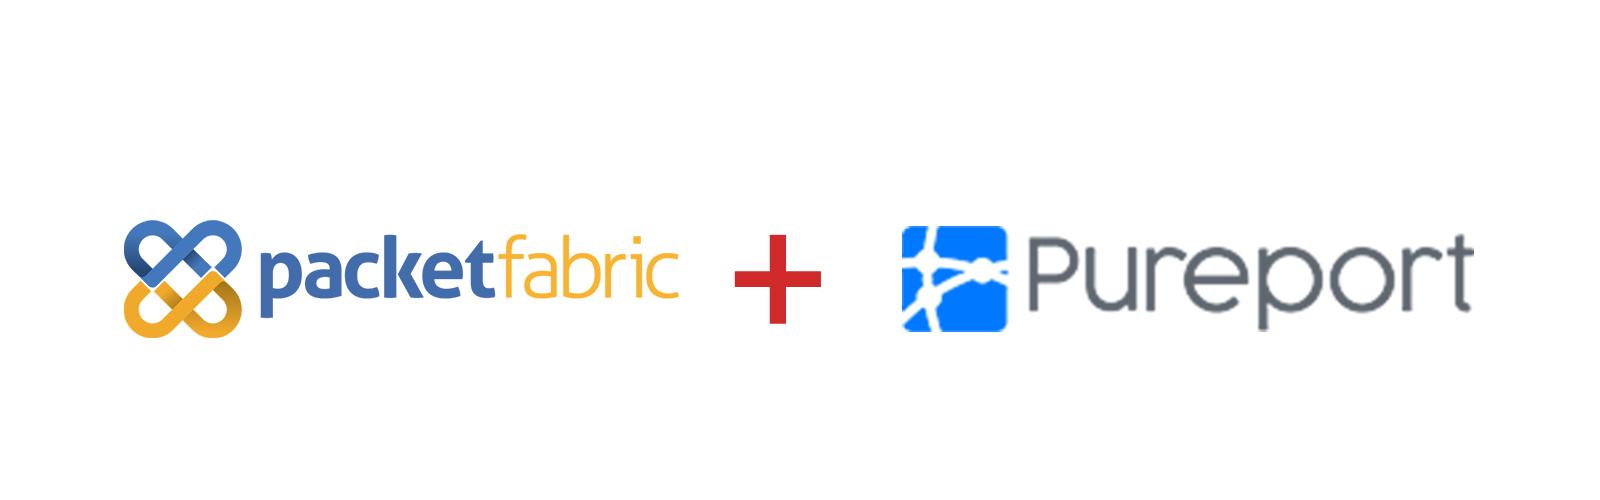 PacketFabric, Pureport, Cloud